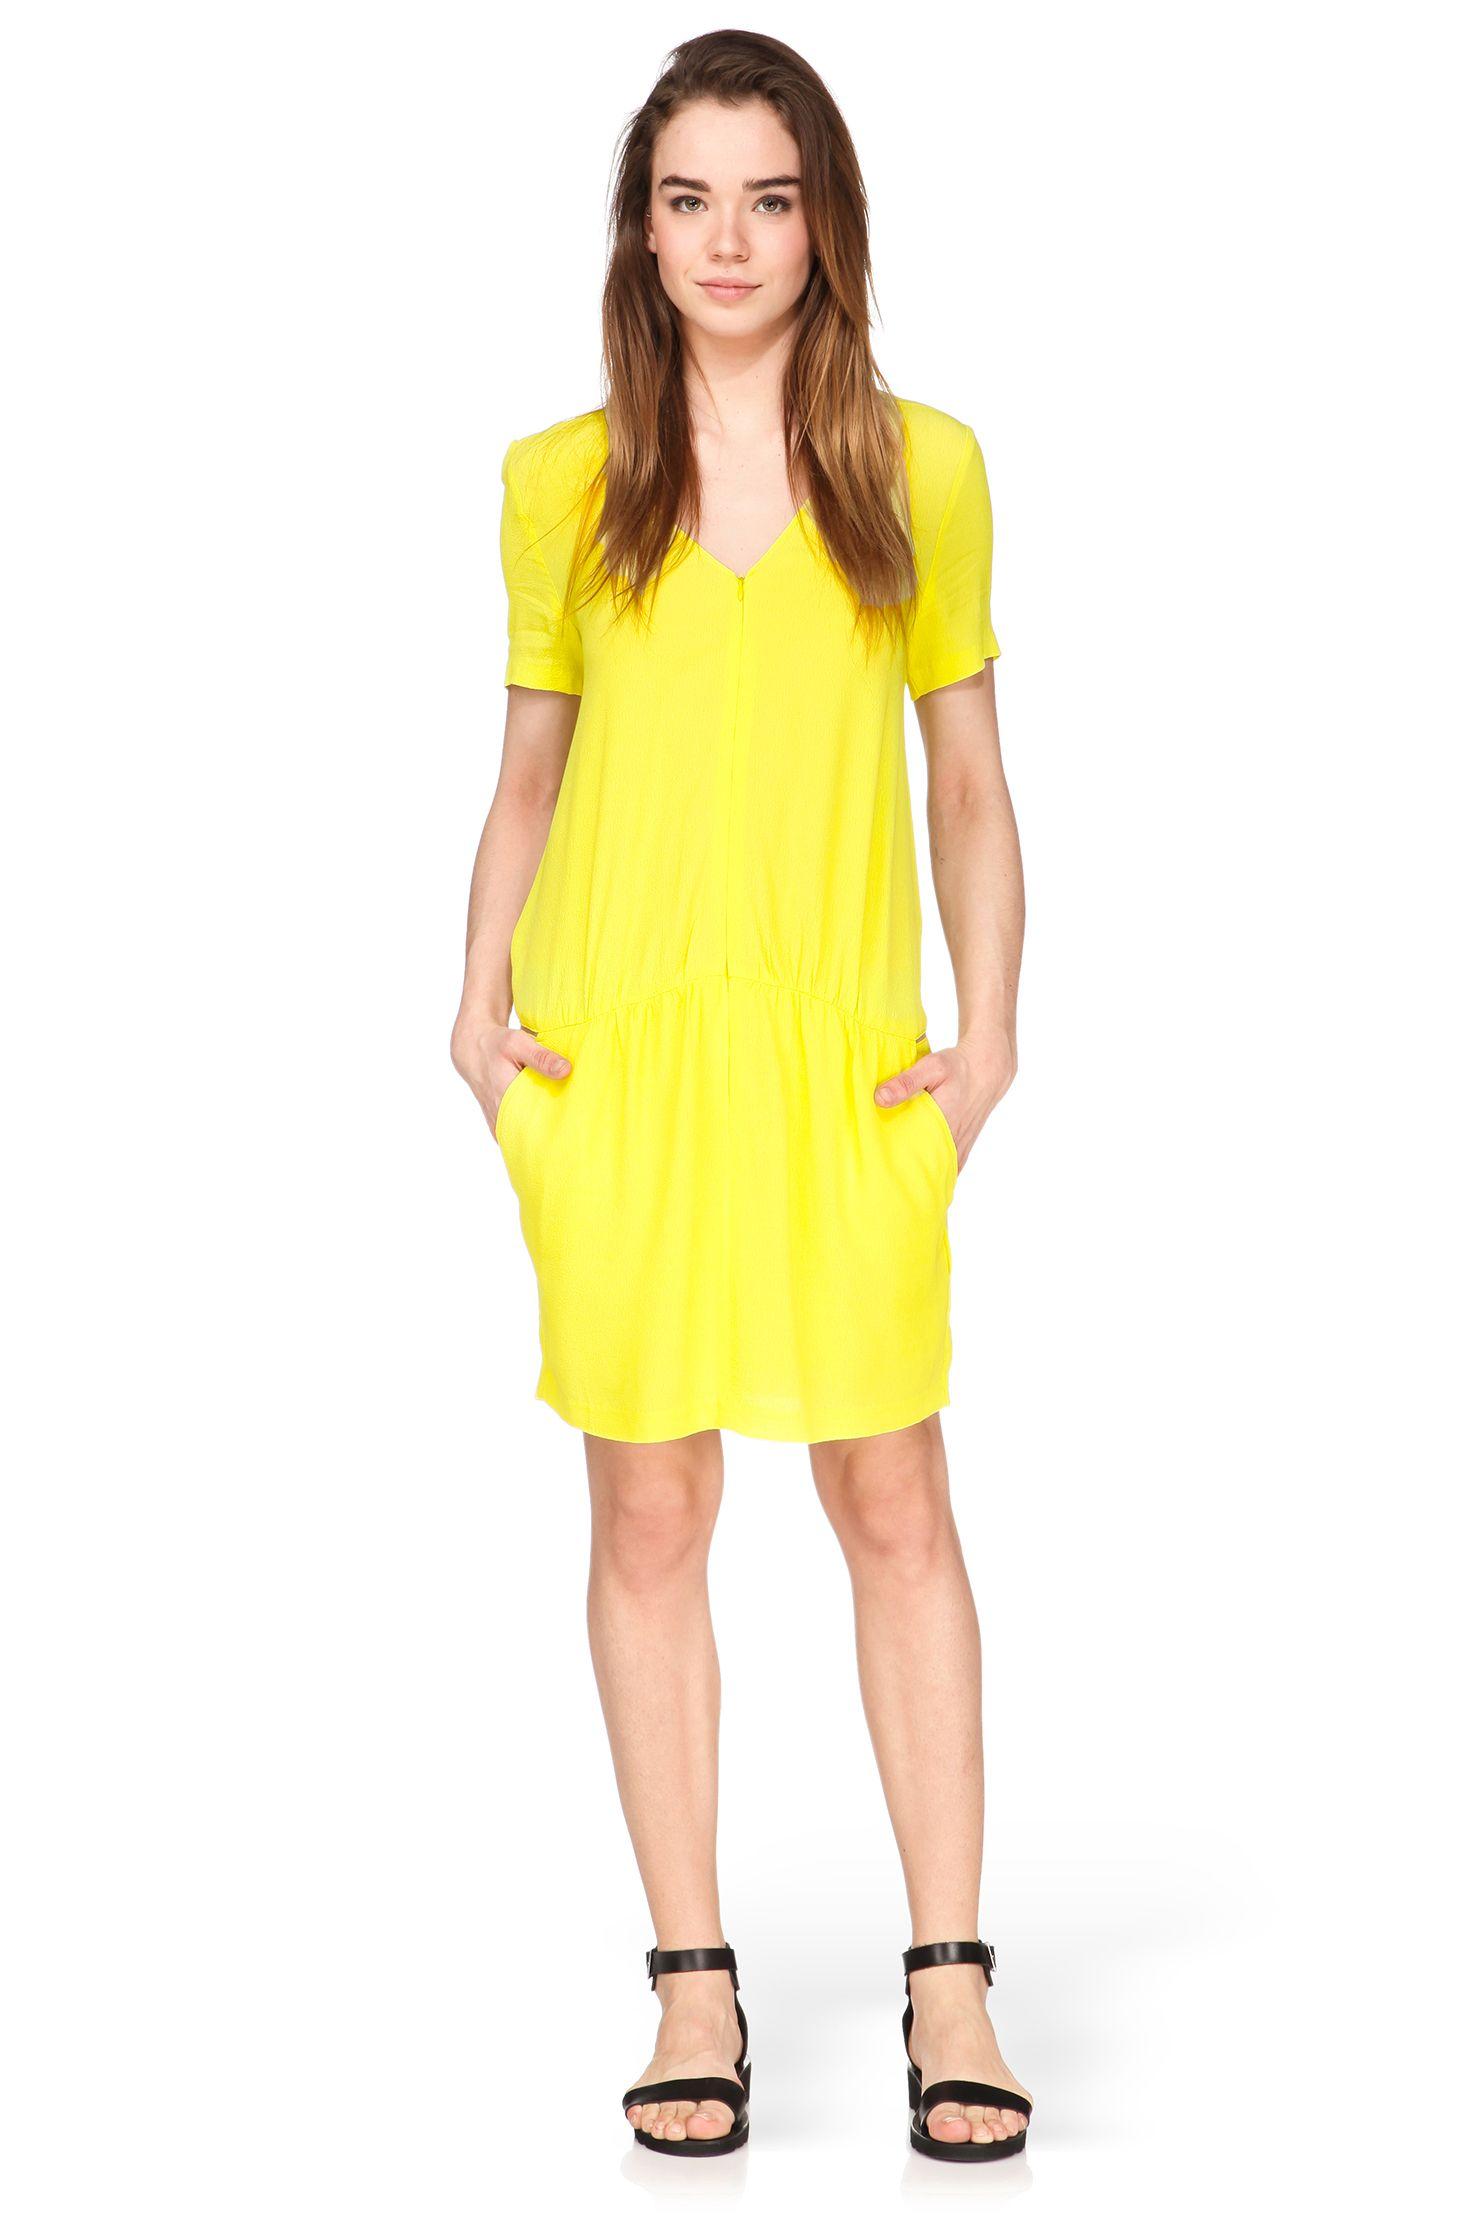 bac4a5d62433 Robe zippée jaune Priscilla Ba sh sur MonShowroom.com   To buy ...